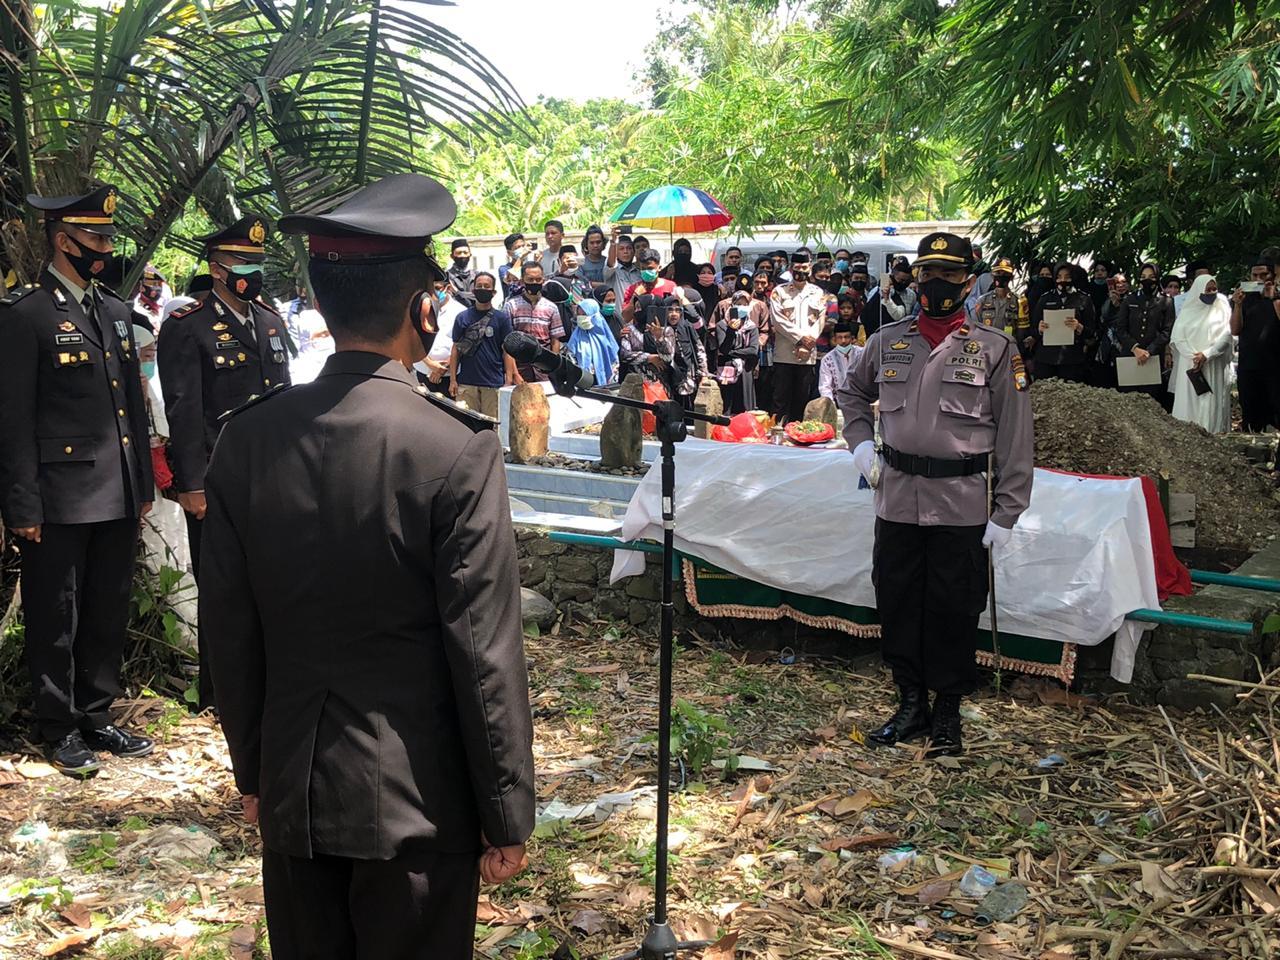 Beri Penghormatan Terakhir, Polres Soppeng Gelar Upacara Pemakaman AKBP .Purn. H. Sahir HW Secara Kedinasan Polri